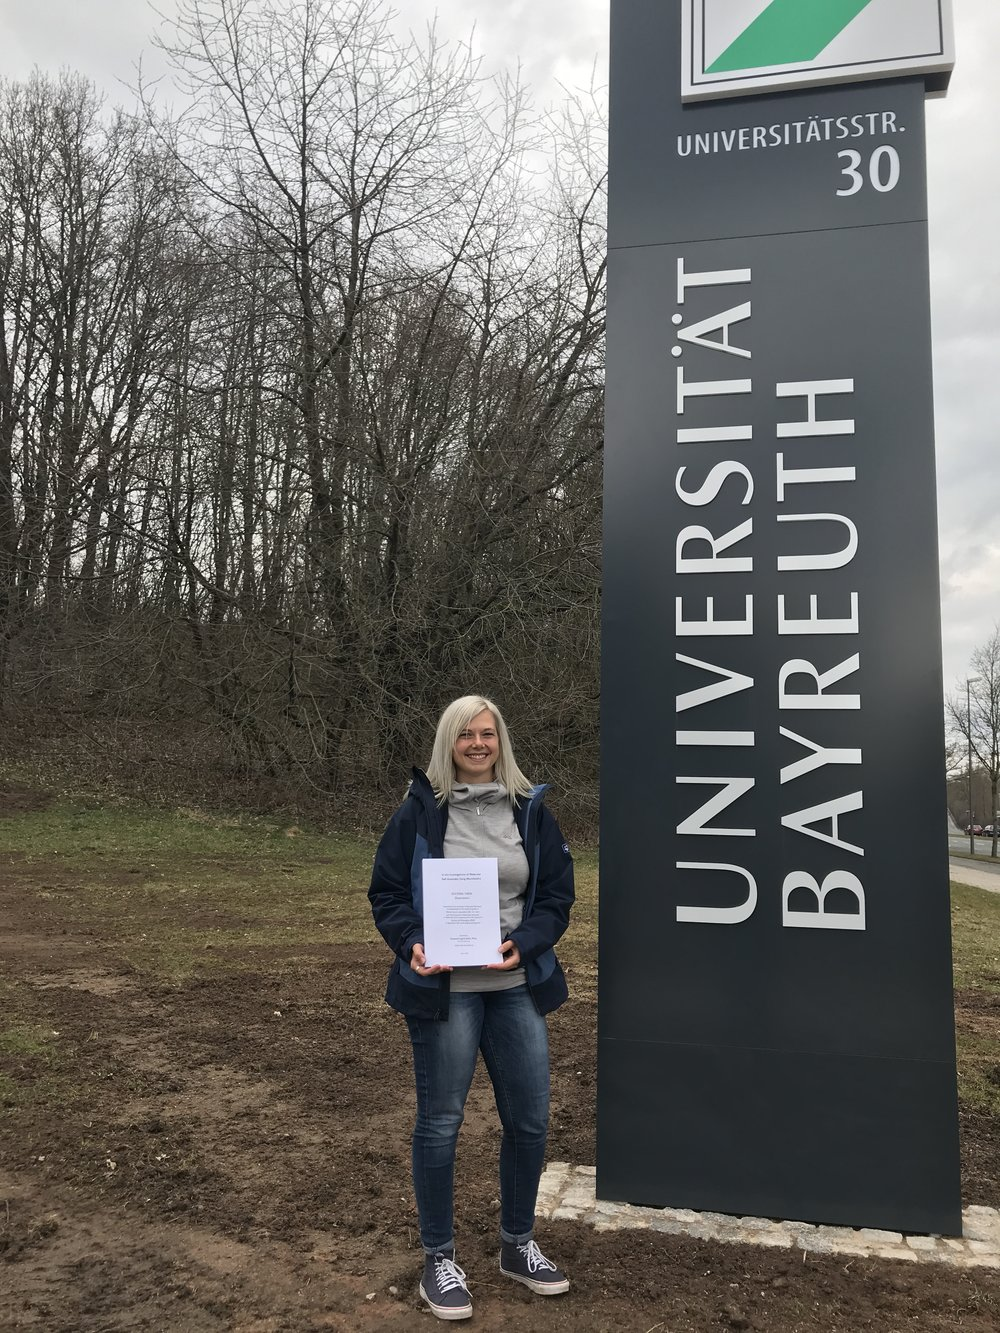 Susanne Seibt thesis submission 2018.JPG